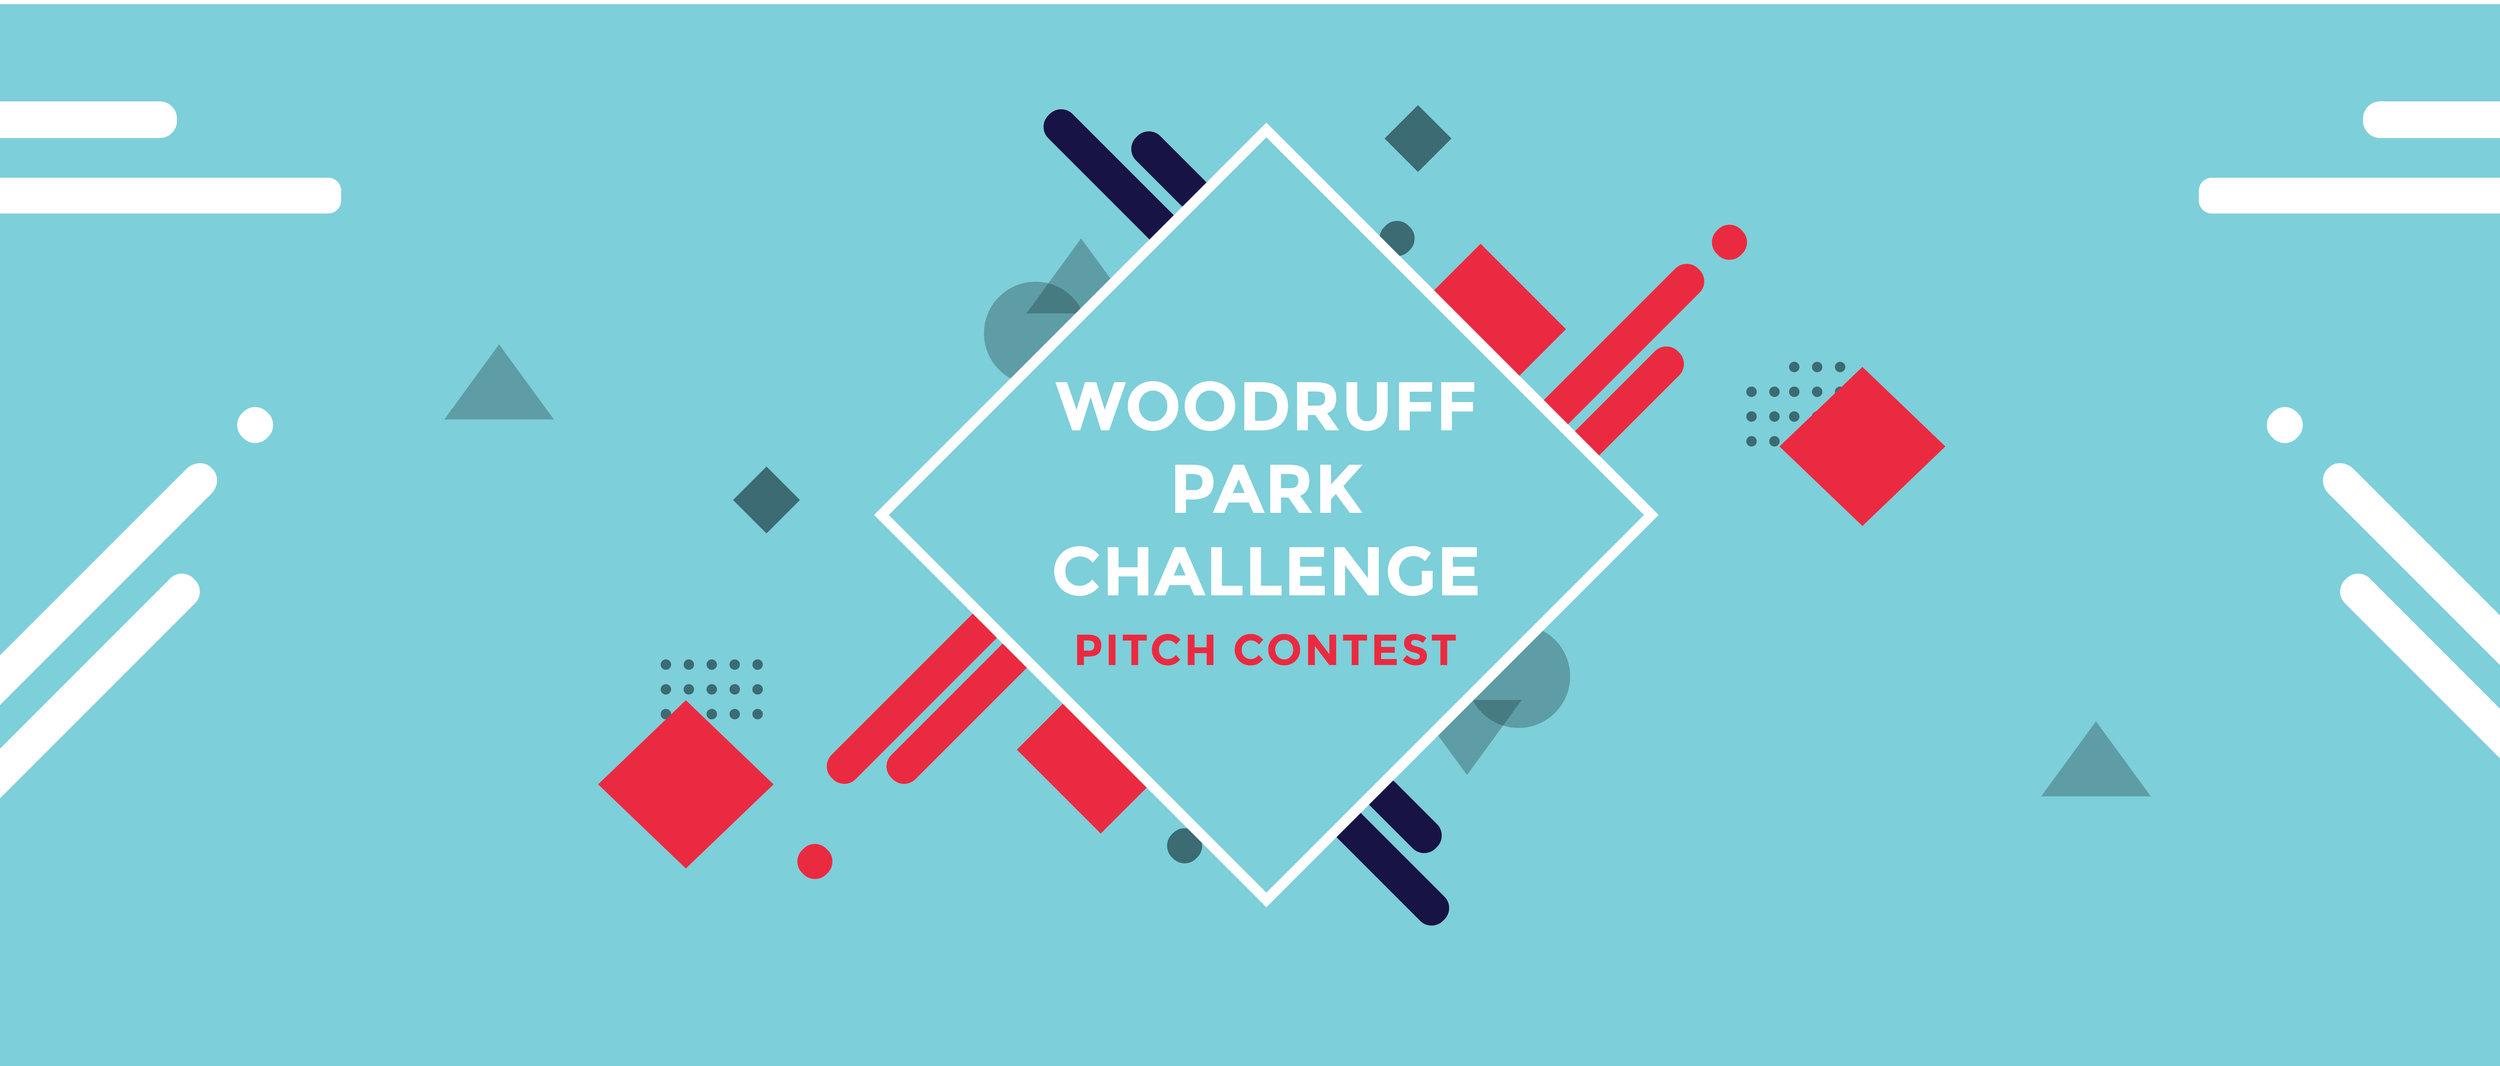 pitch_contest-01.jpg